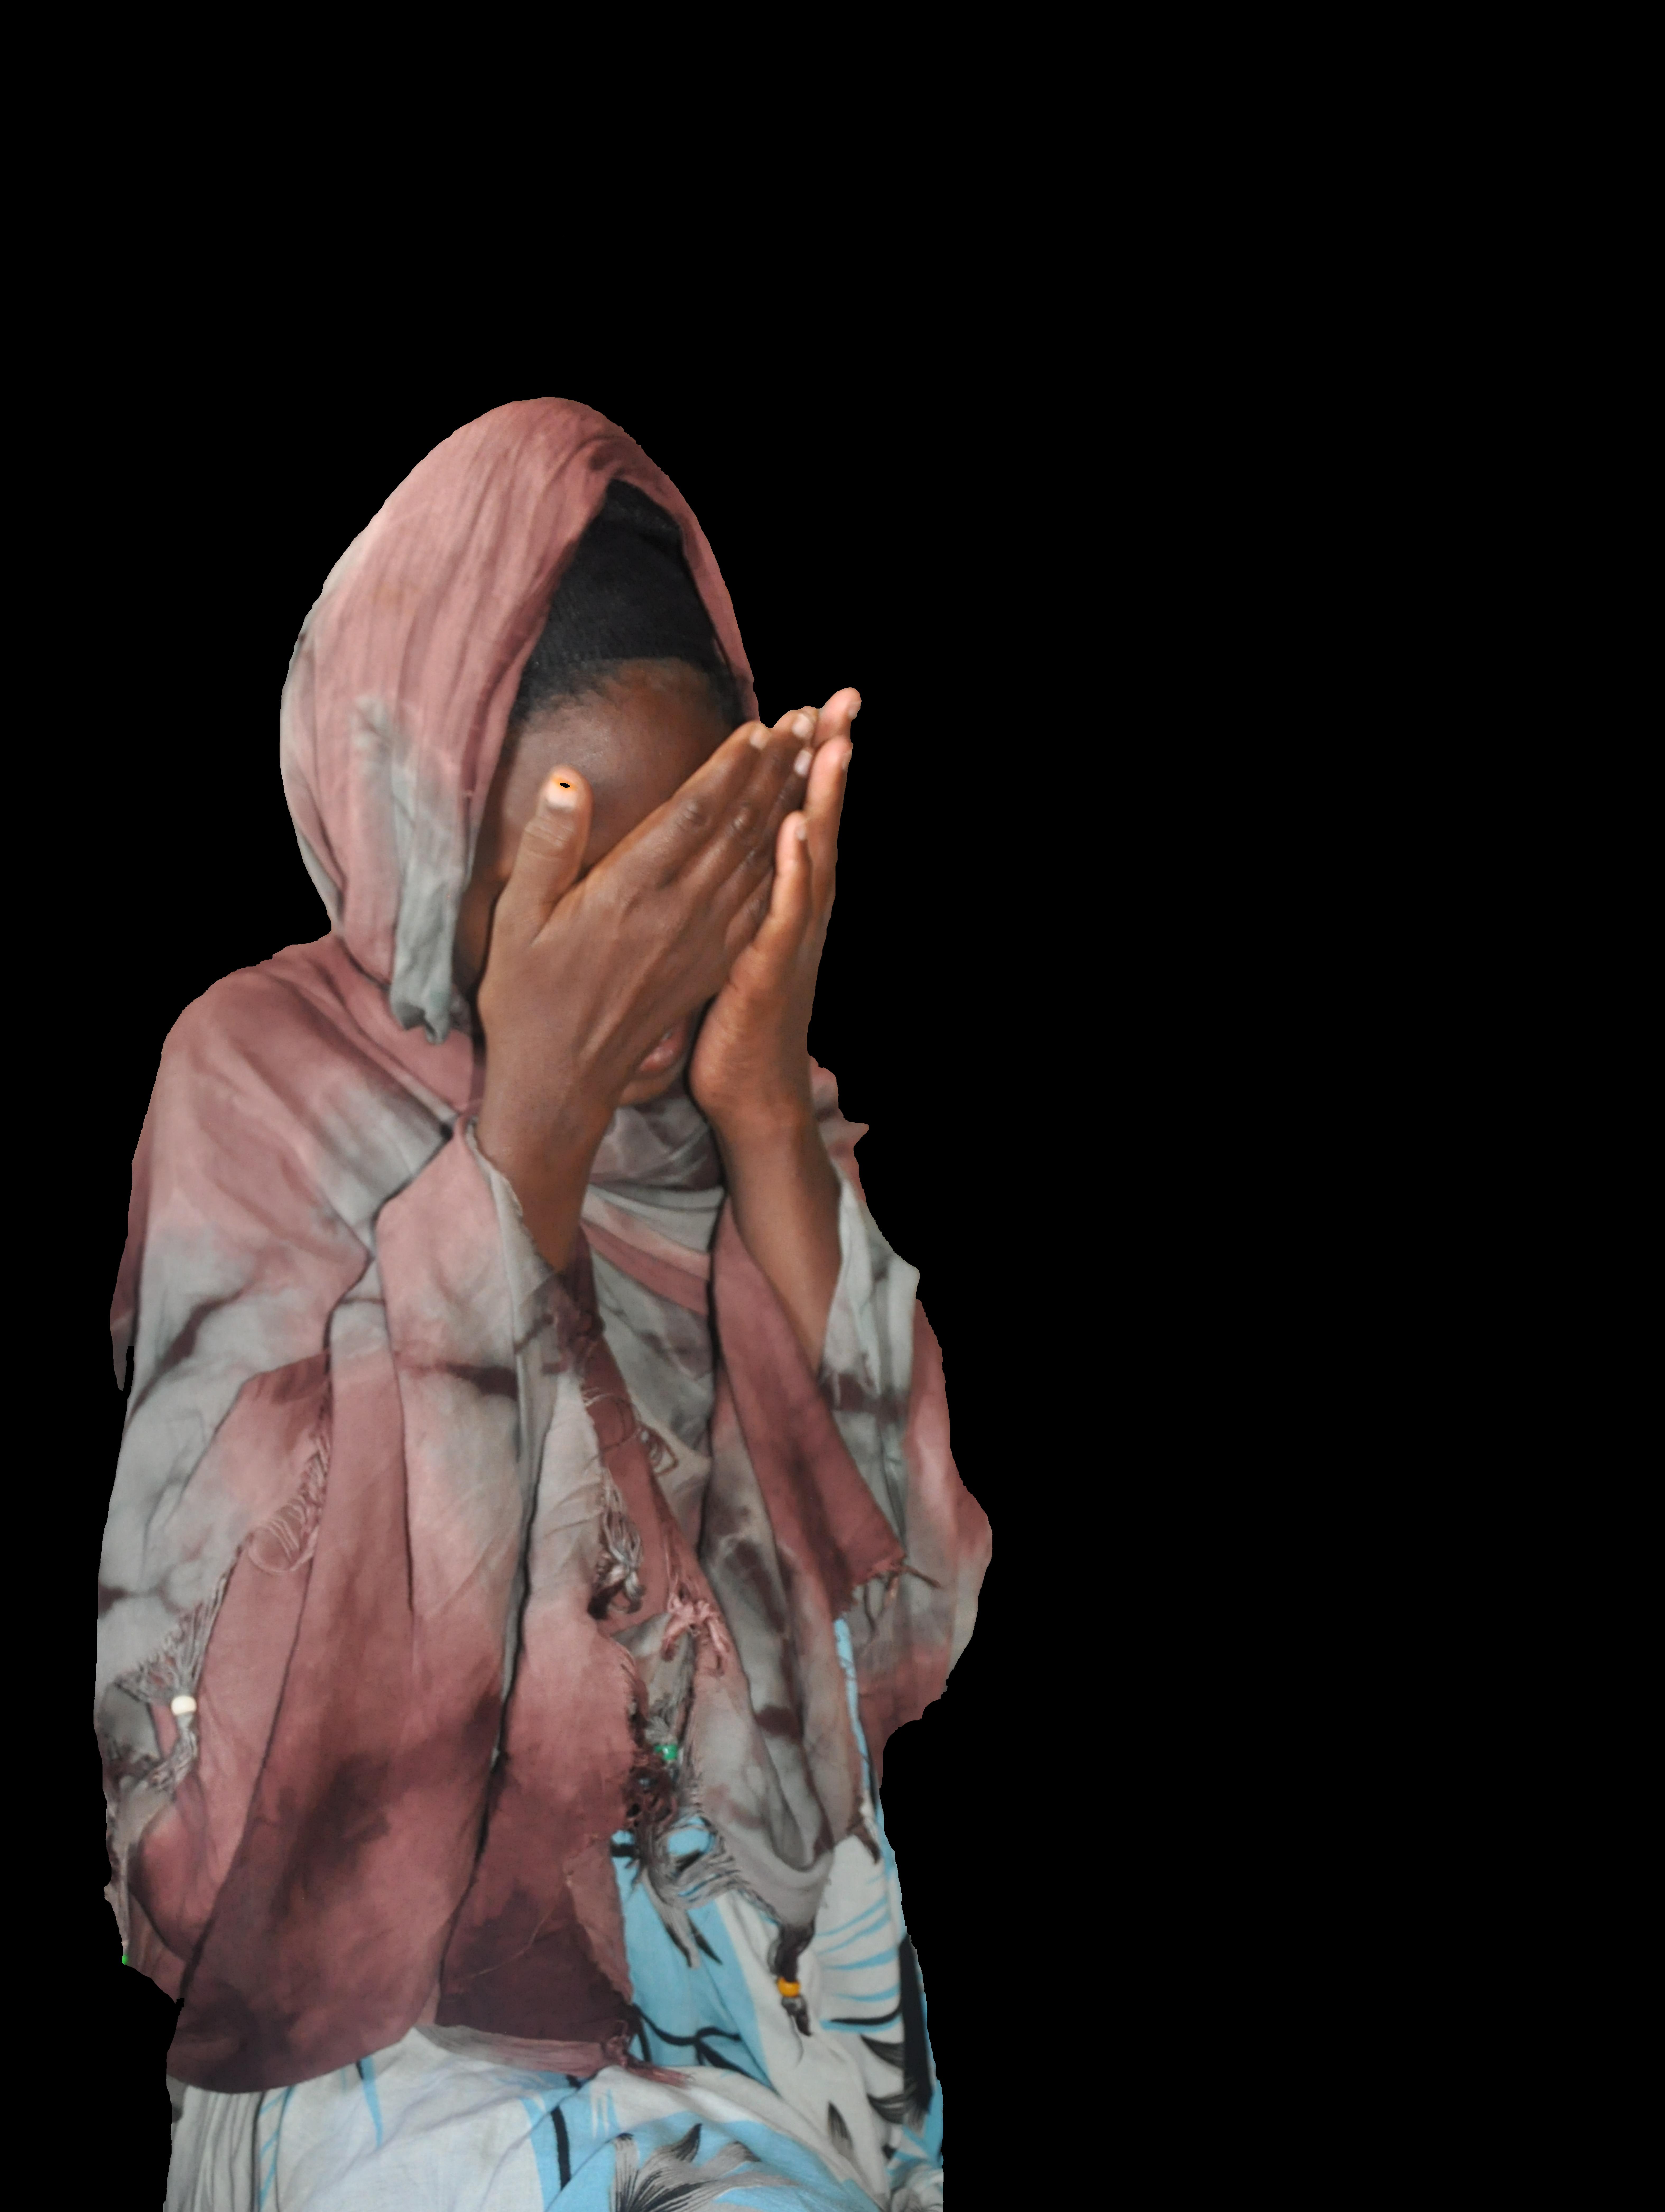 Ending Fistula in Somalia